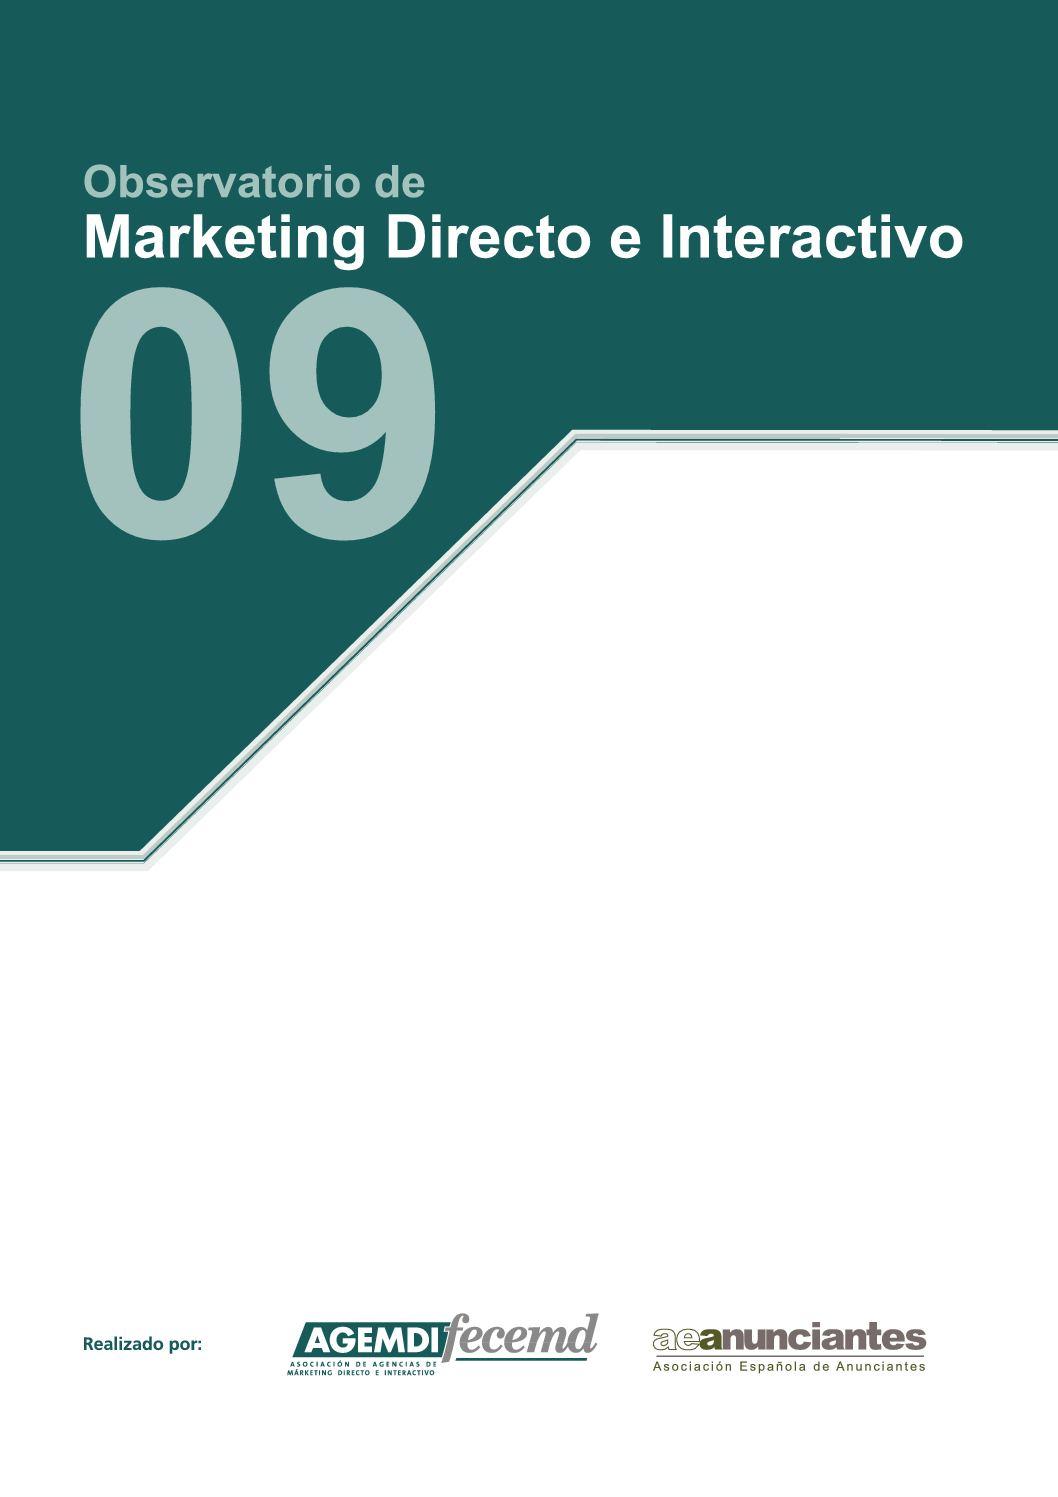 Observatorio de Marketing Directo e Interactivo